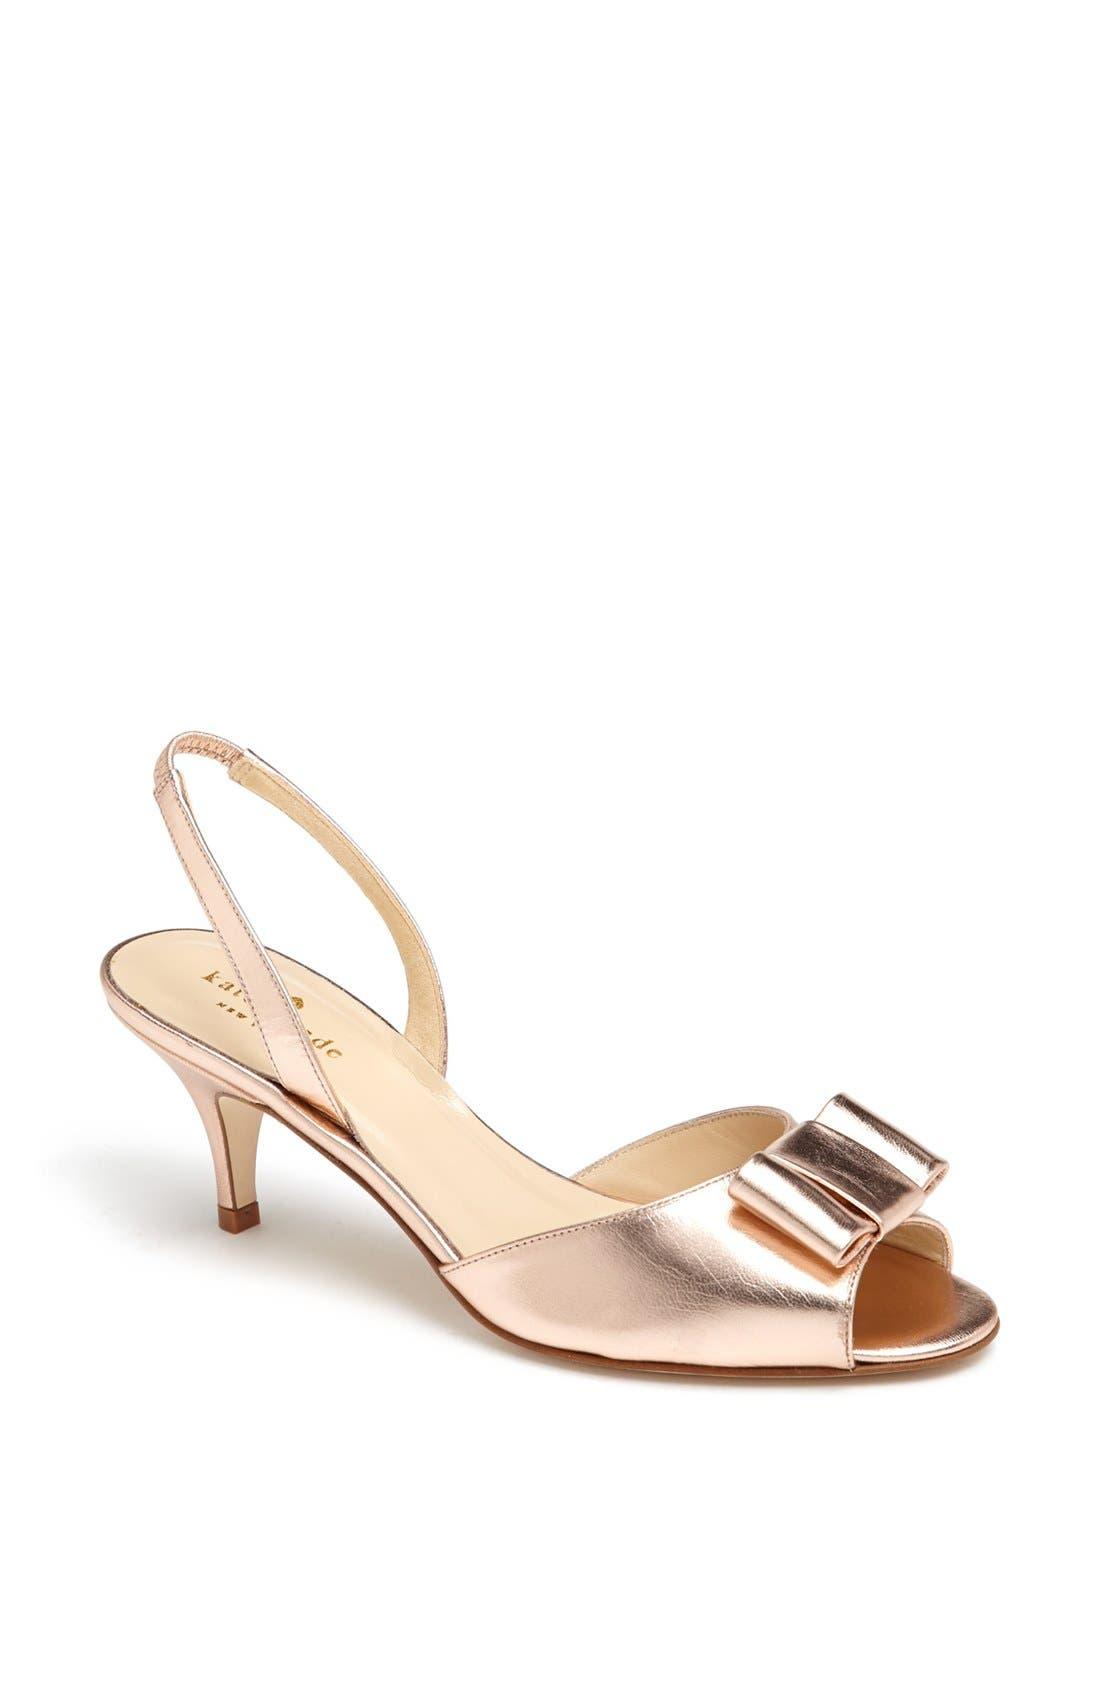 Main Image - kate spade new york 'emelia' sandal